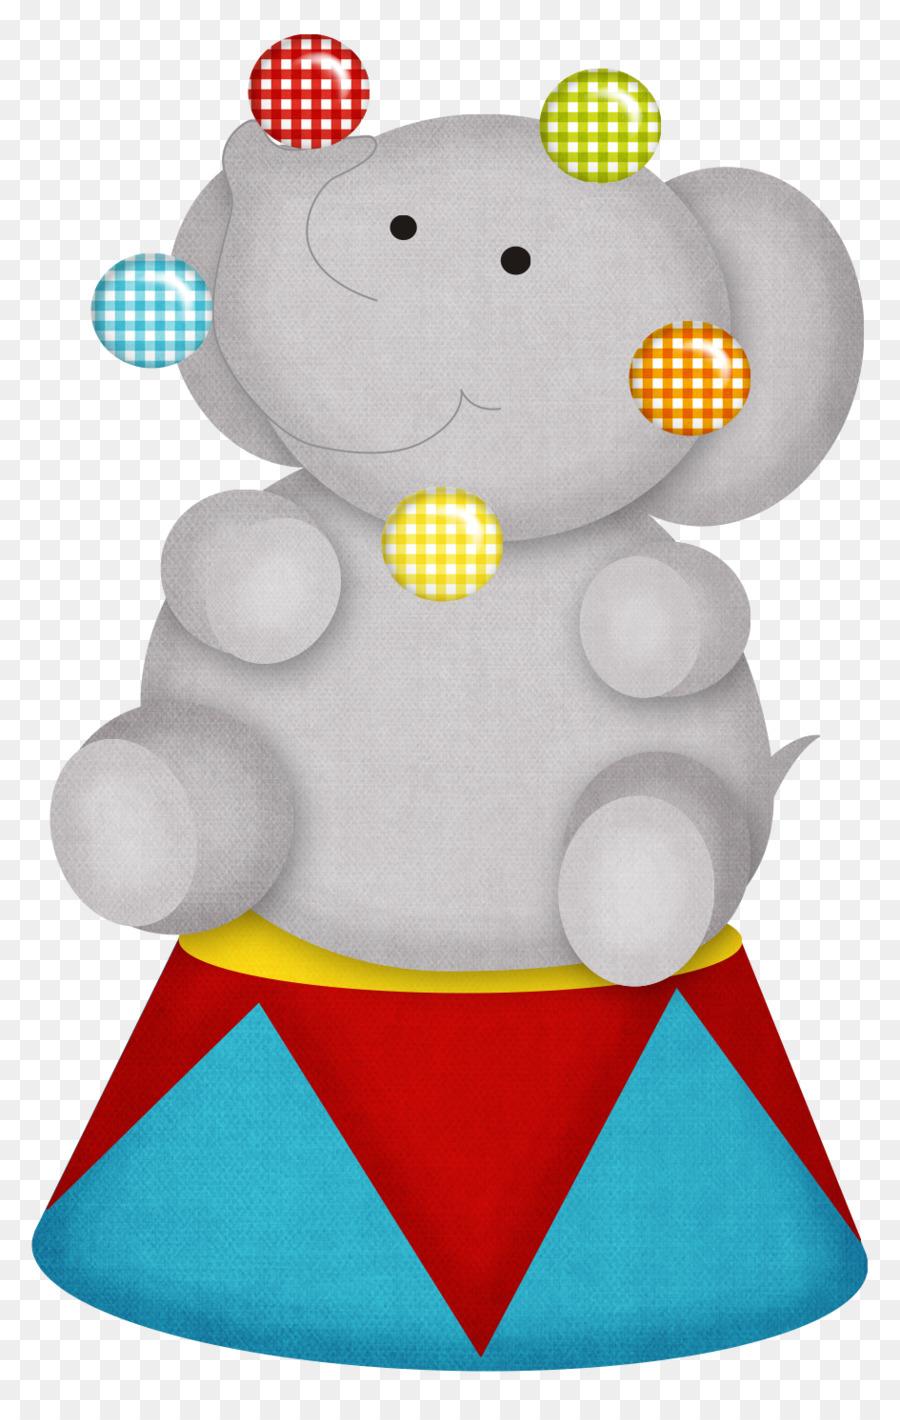 900x1420 Circus Elephant Clown Clip Art